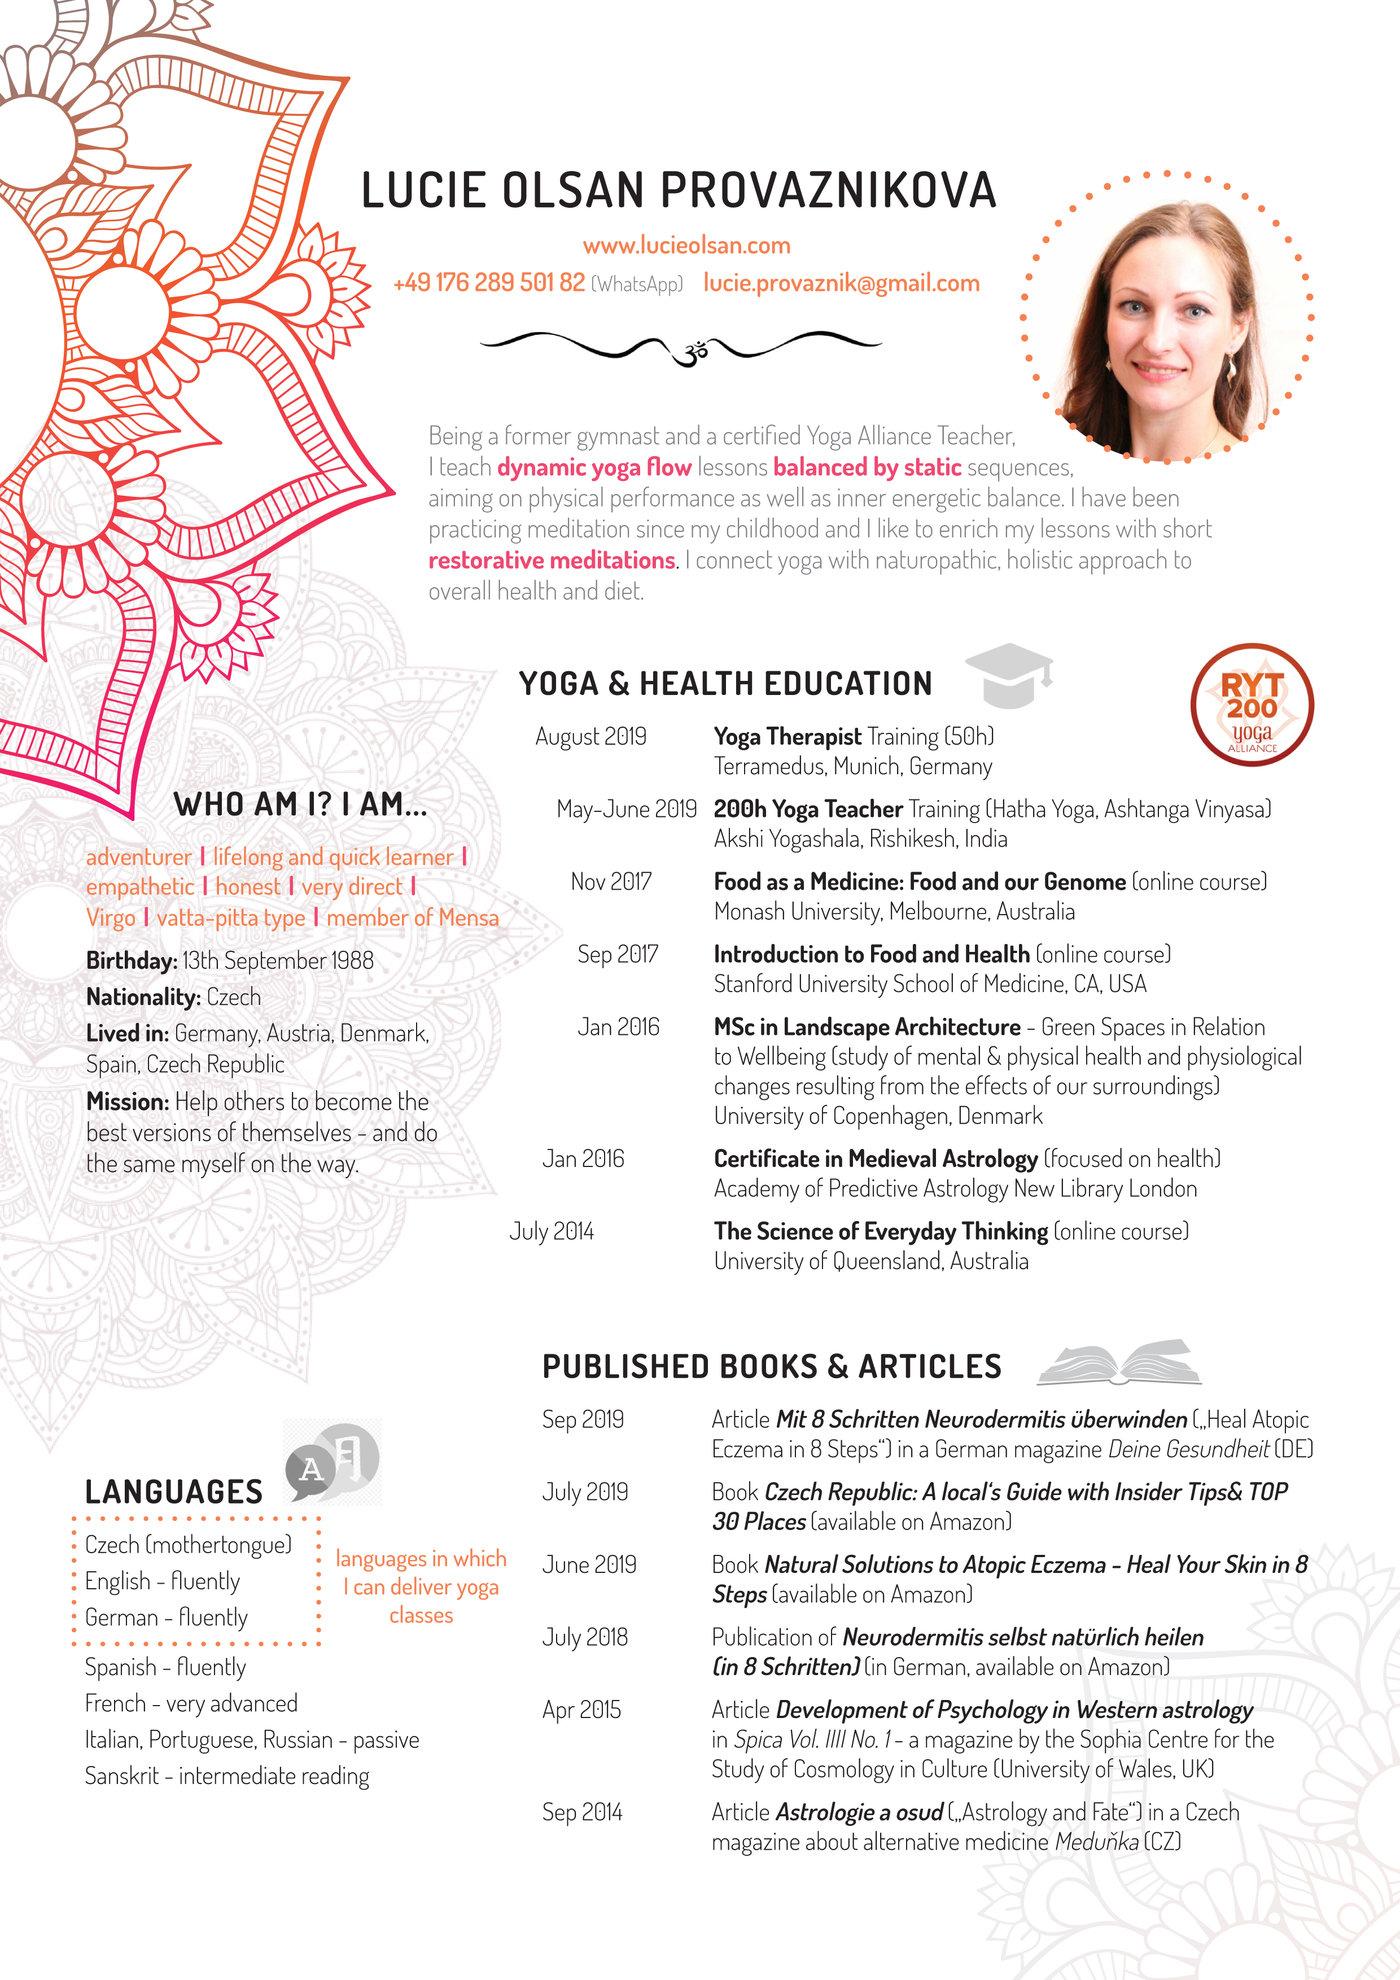 Resume Design Yoga Teacher By Lucie Provaznikova At Coroflot Com